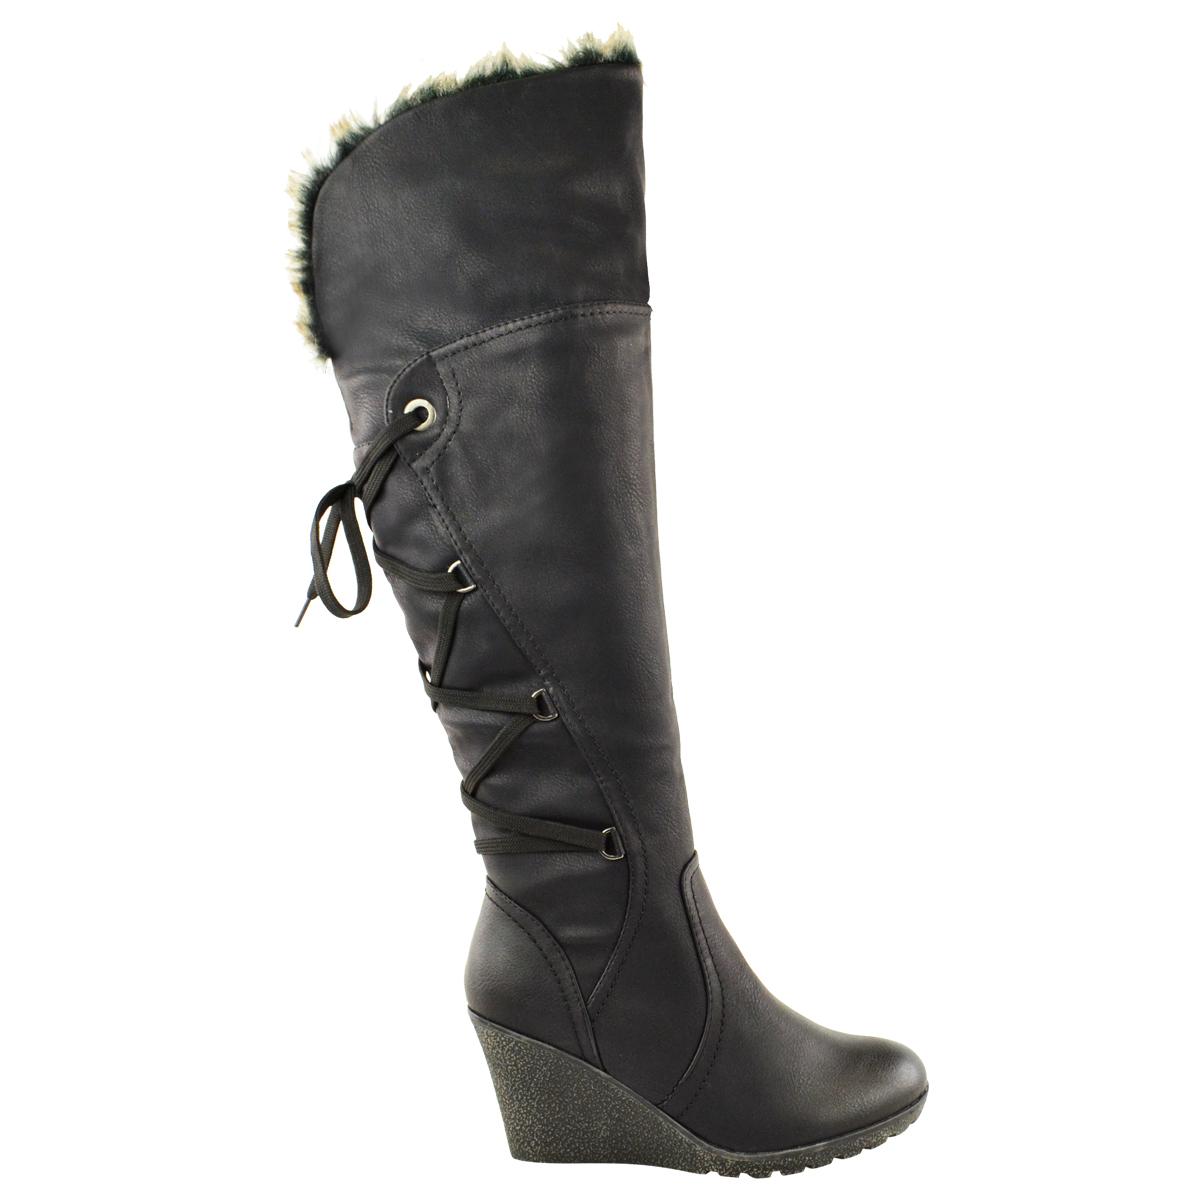 Womens-Ladies-Wedge-Low-Heel-Winter-Knee-Boots-Warm-Faux-Fur-Fleece-Size-UK thumbnail 3